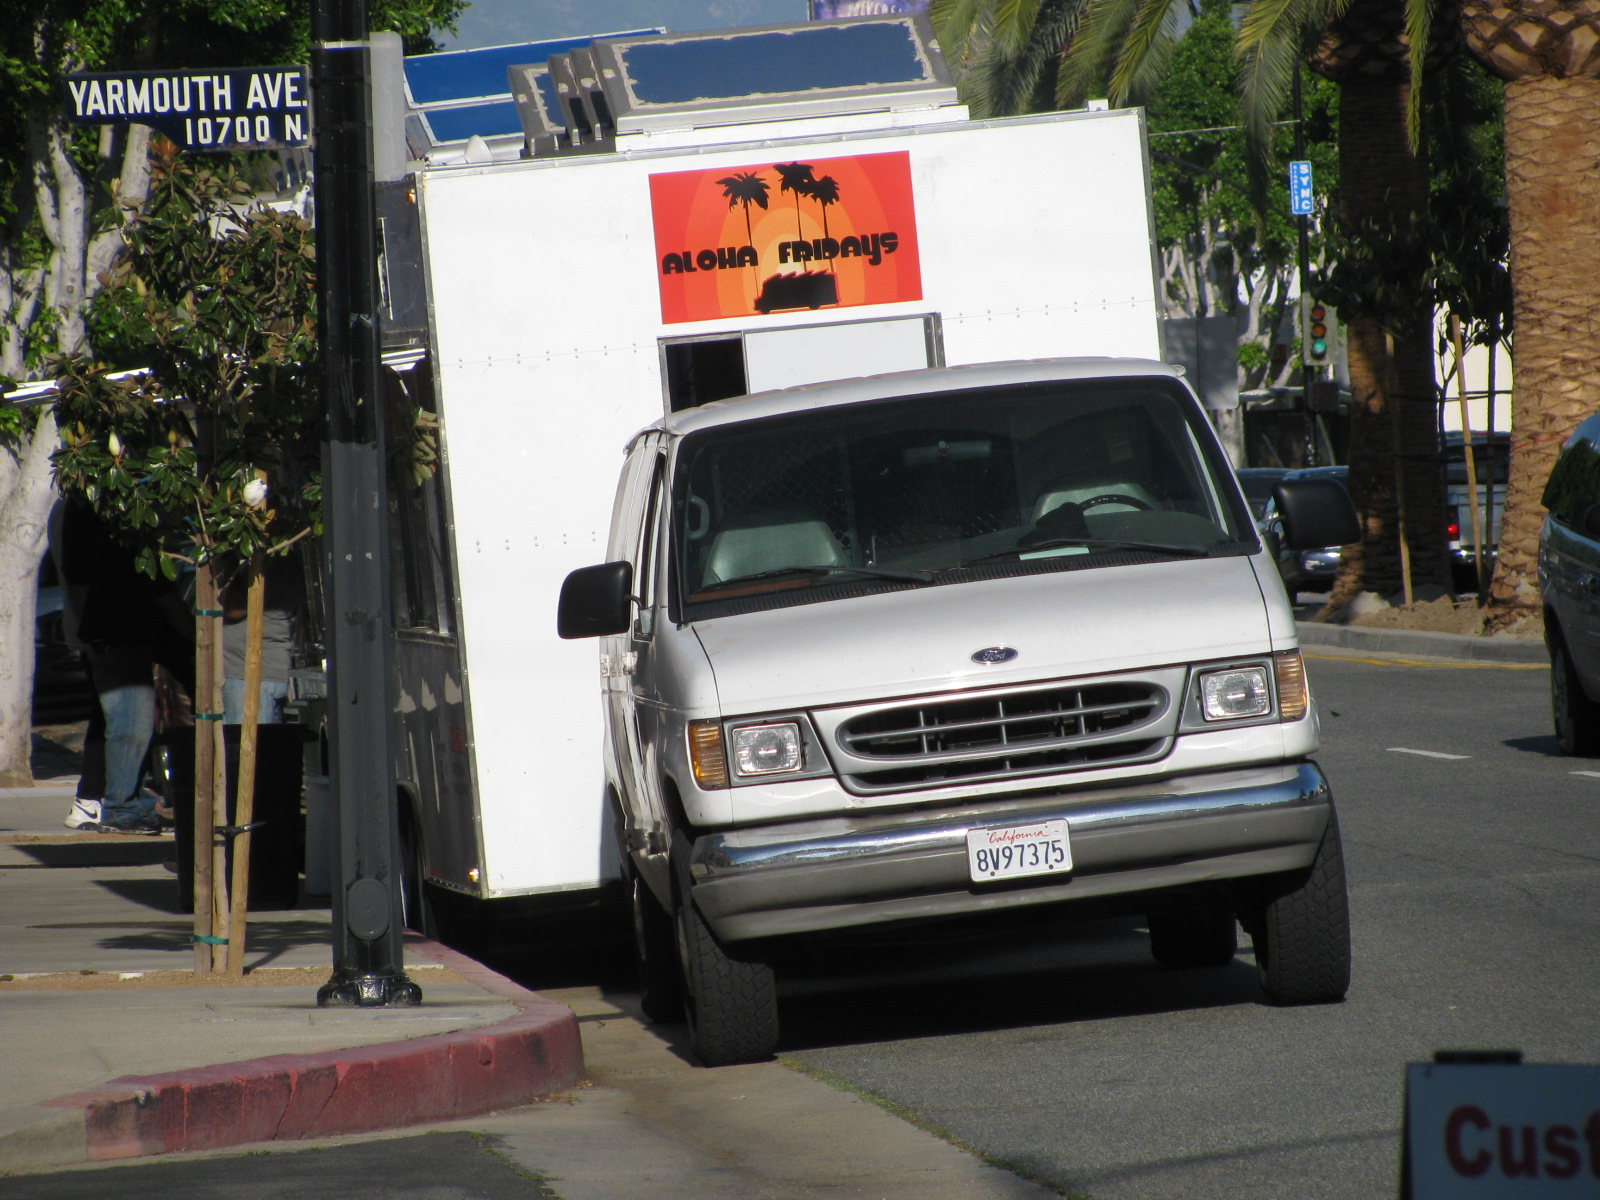 66 Mustang Craigslist Ga Warner Robins Autos Post